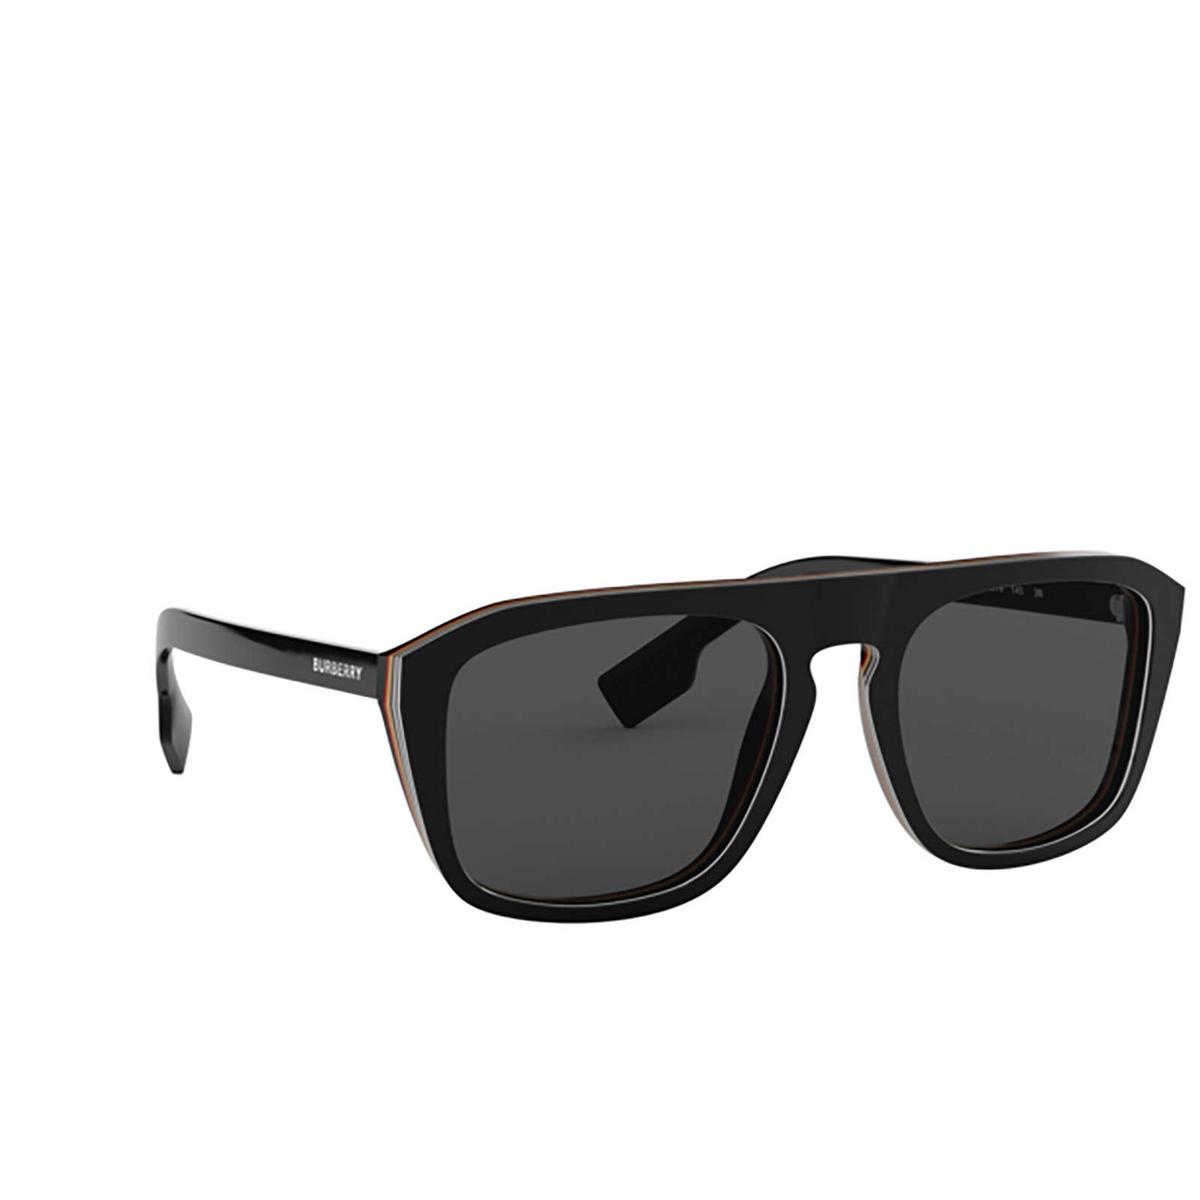 Burberry® Square Sunglasses: BE4286 color Check Multilayer Black 379887 - three-quarters view.